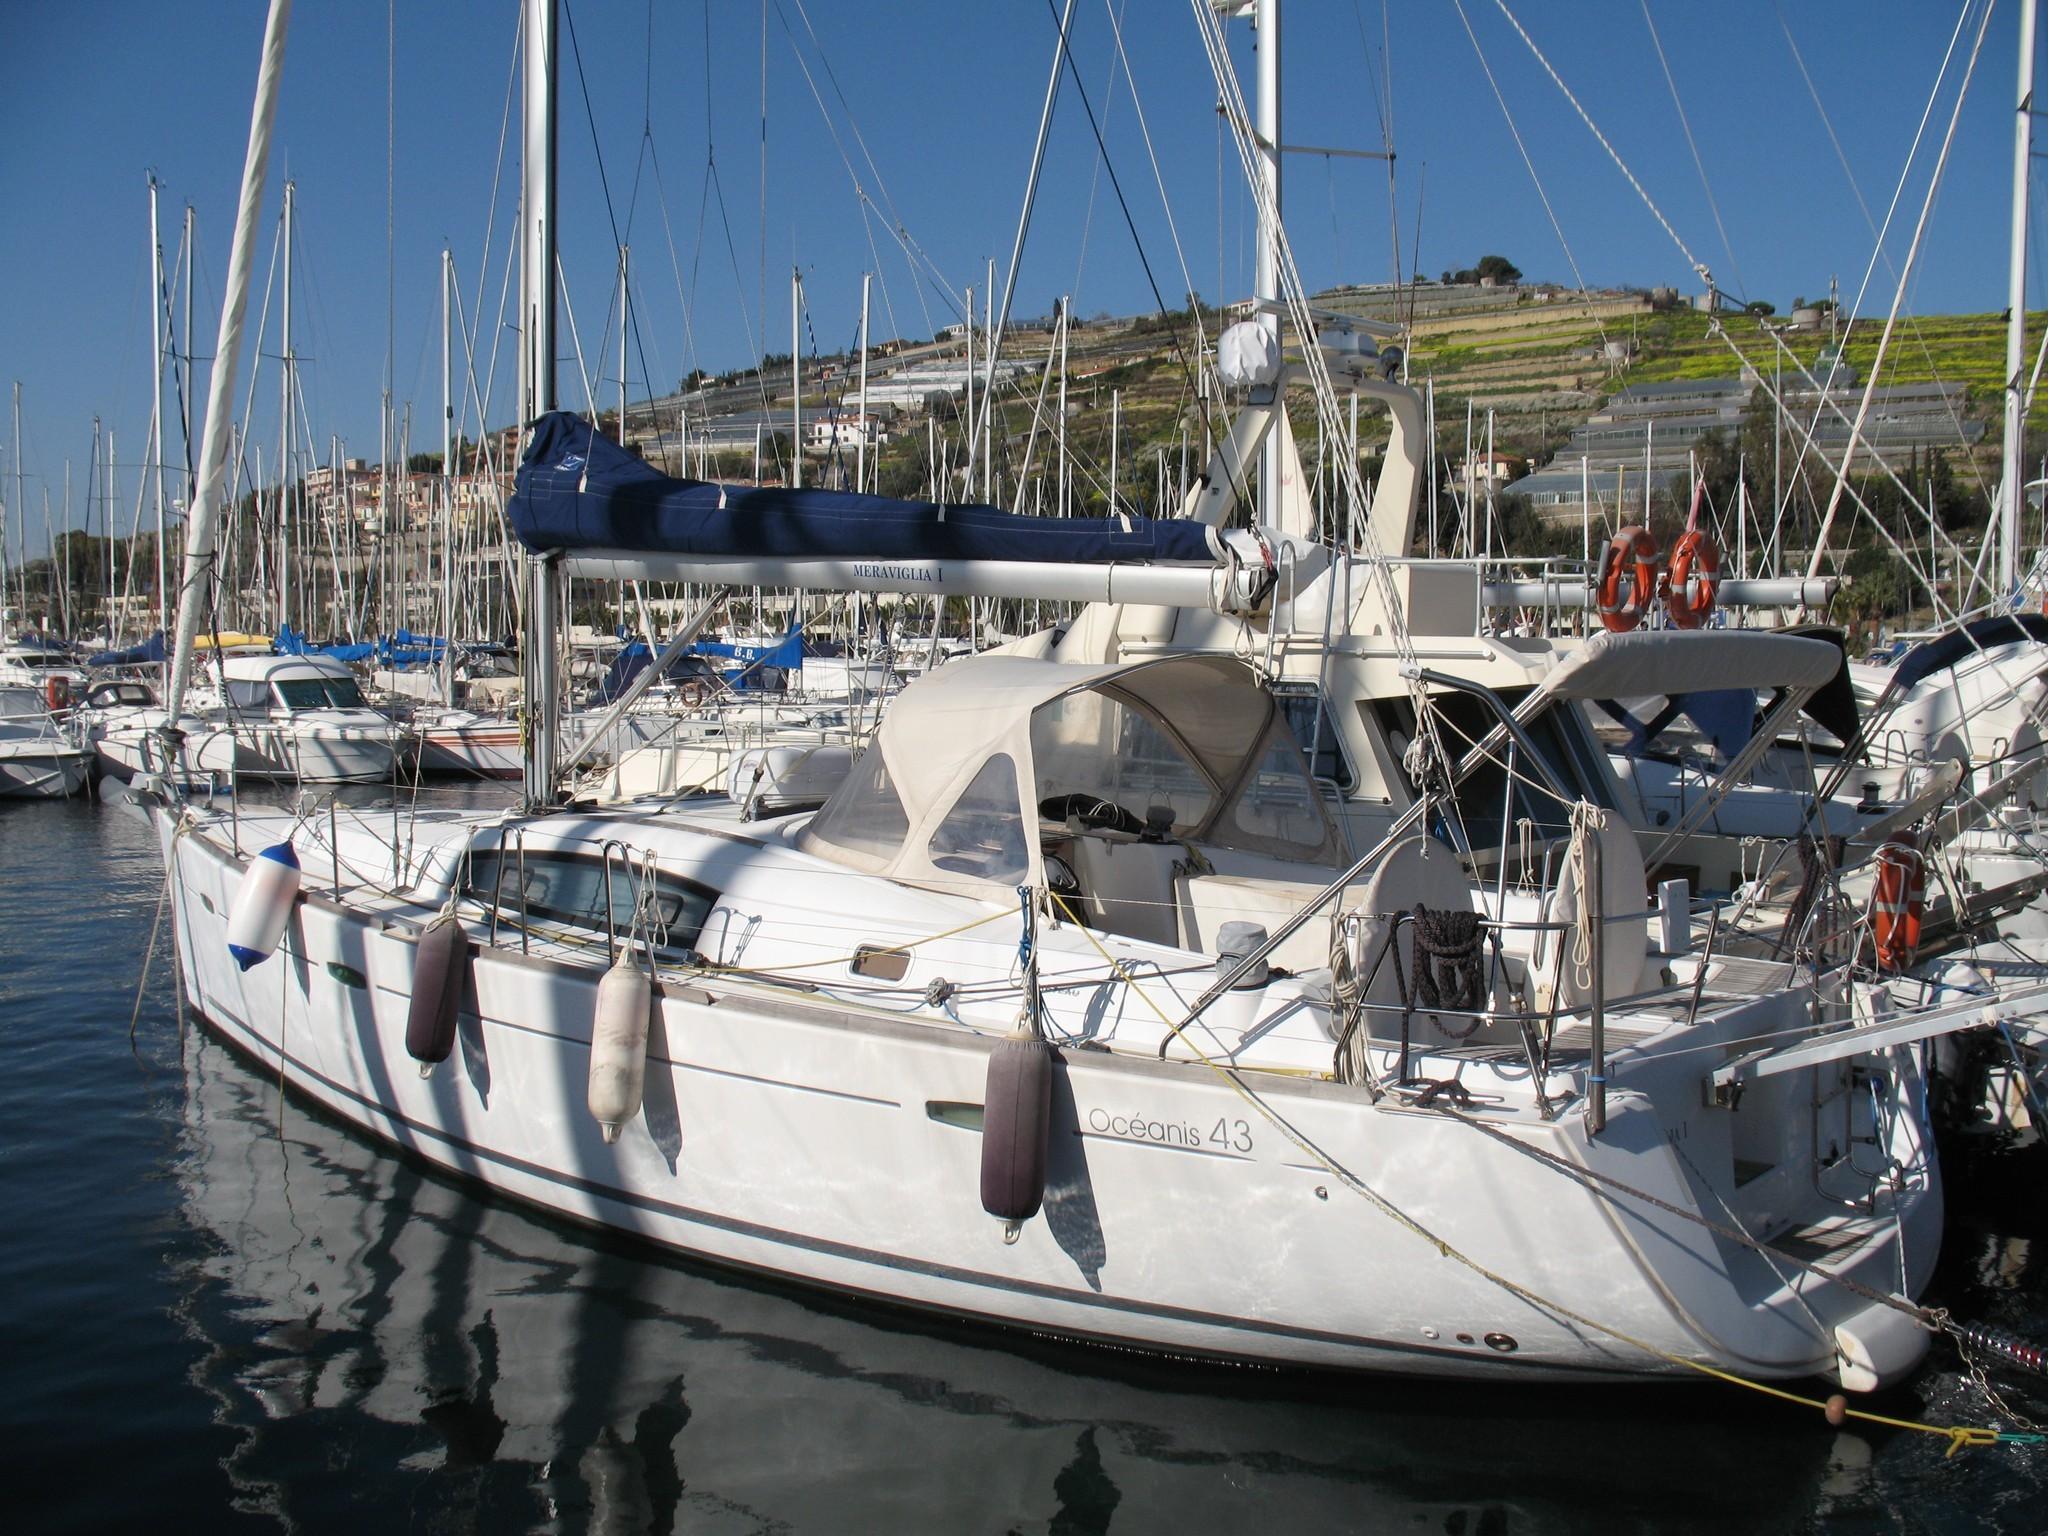 Nuovo arrivo Beneteau Oceanis 43